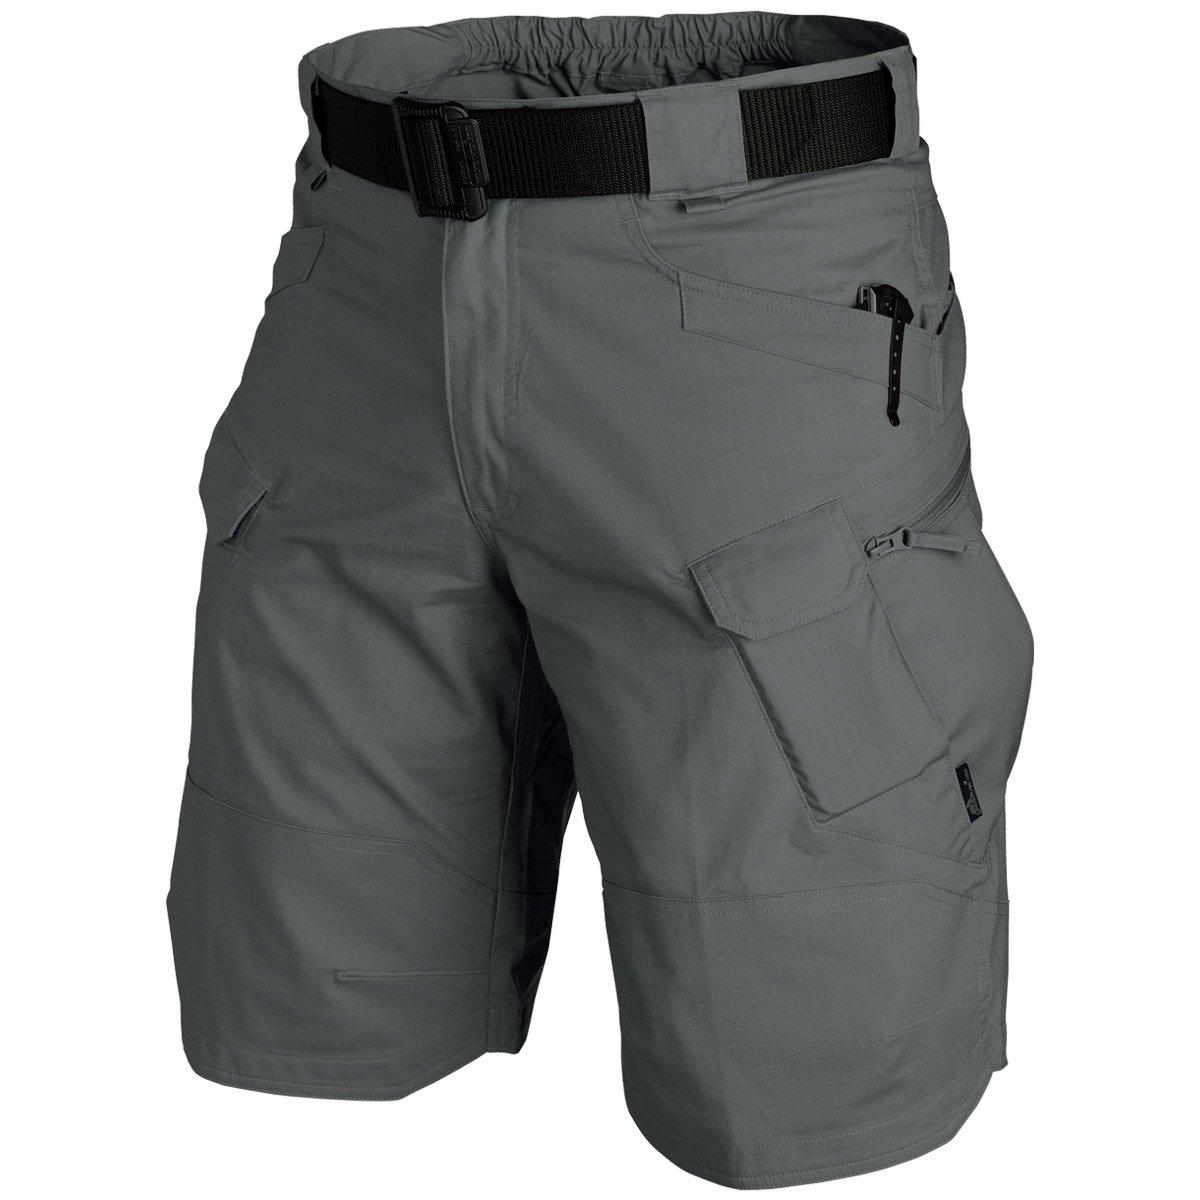 Helikon Urban Tactical Urban Pantaloncini 12 Ombra Grigio Taglia M